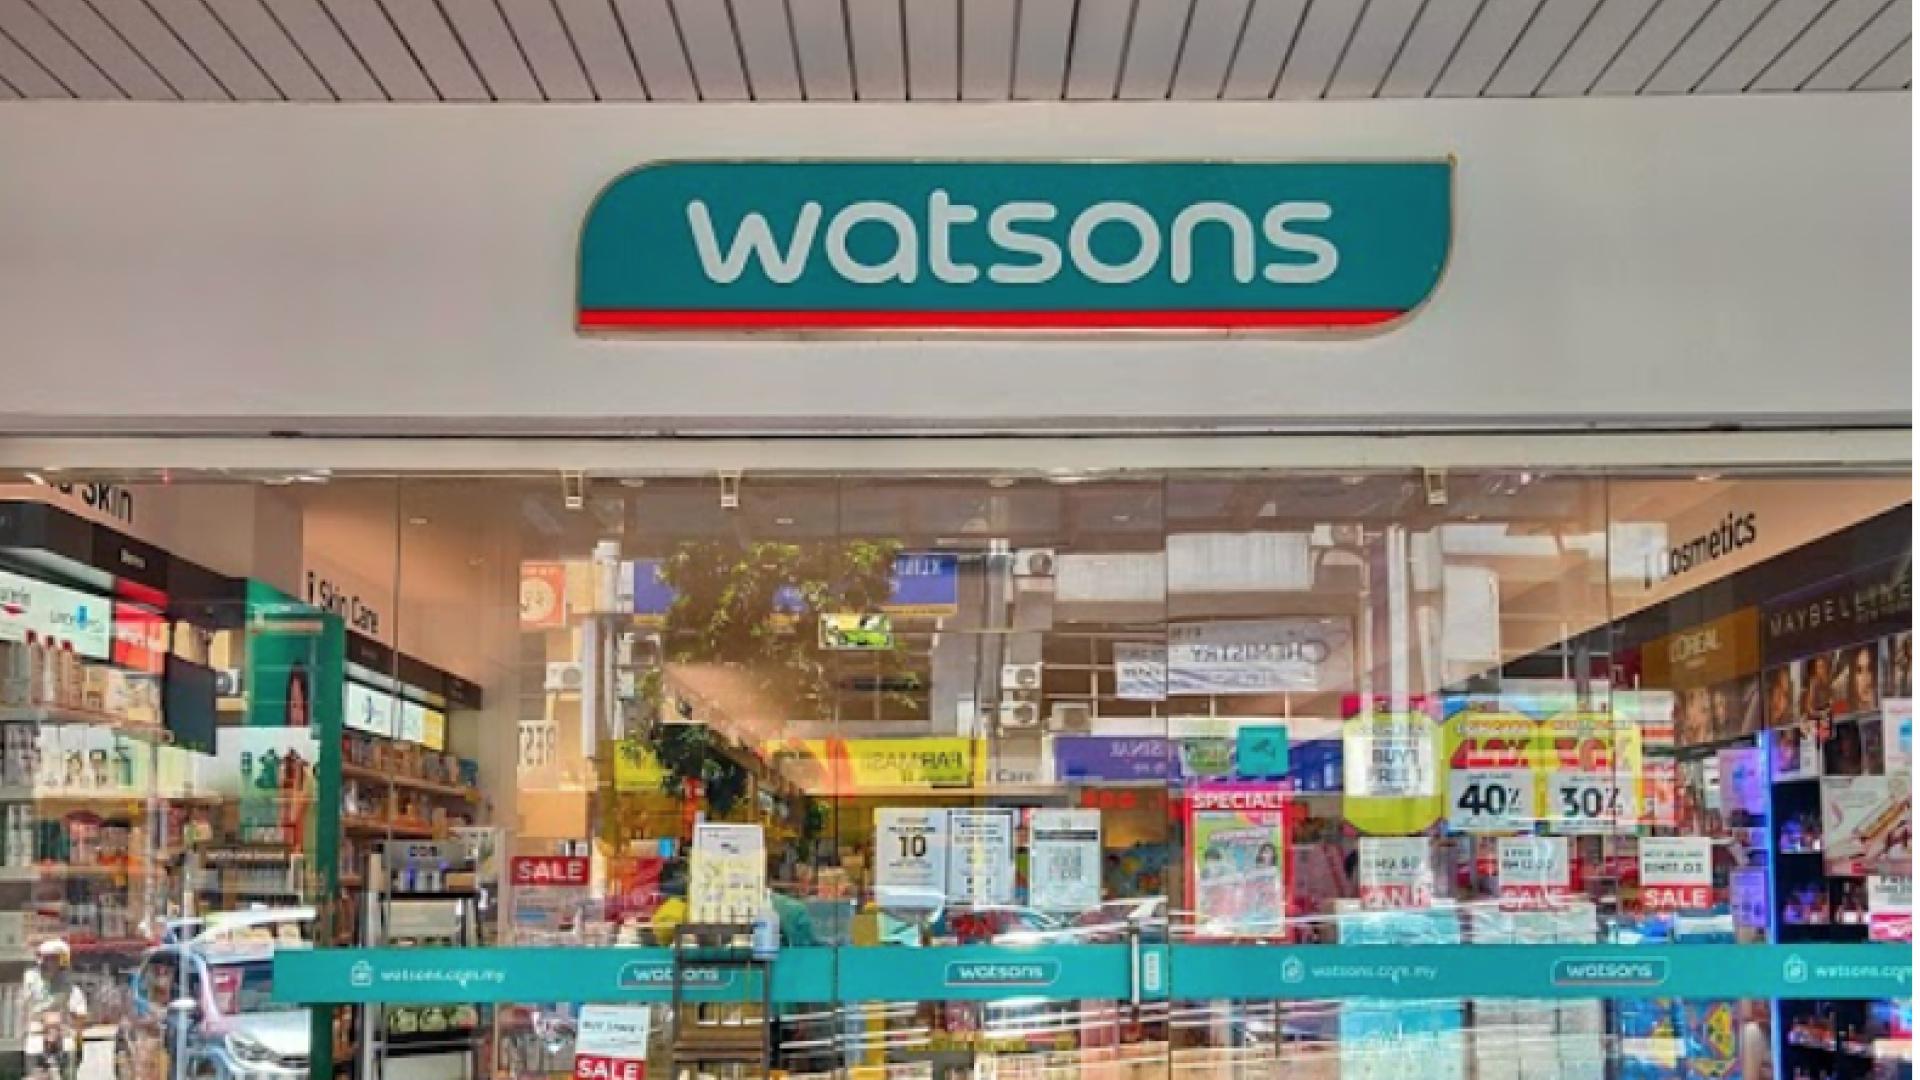 Watsons @ Bandar Puchong Jaya